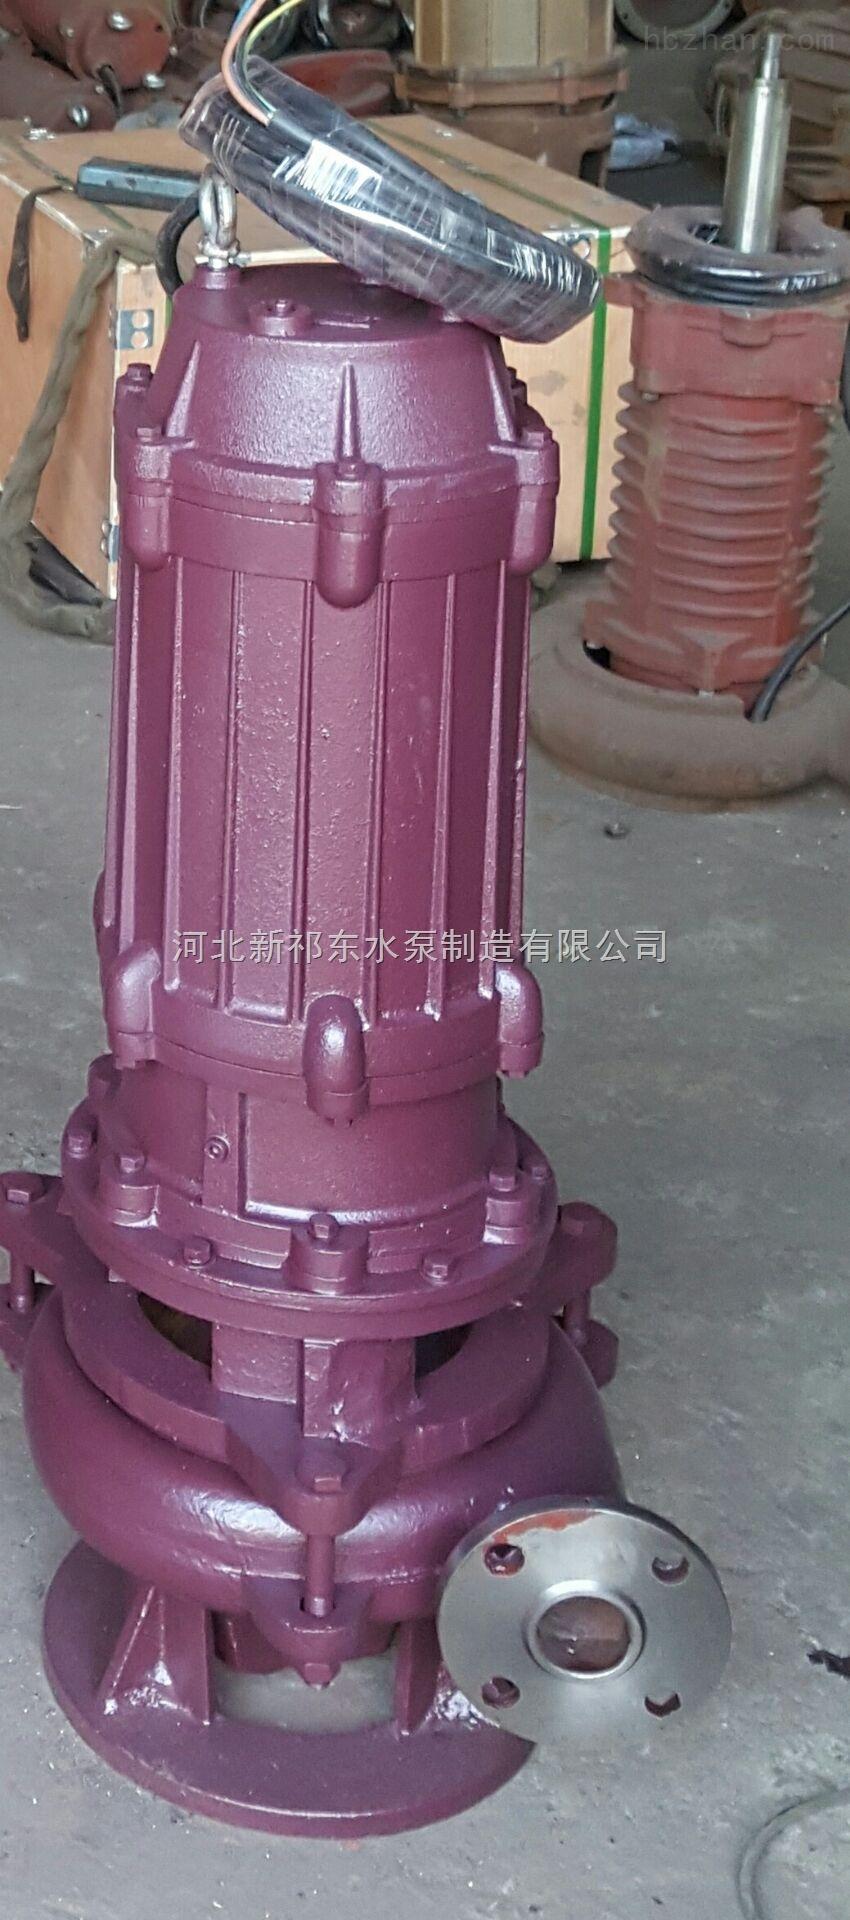 40zjq21-9.5 立式潜水渣浆泵矿用搅拌粉煤灰泵杂质泵清淤泵新祁东水泵